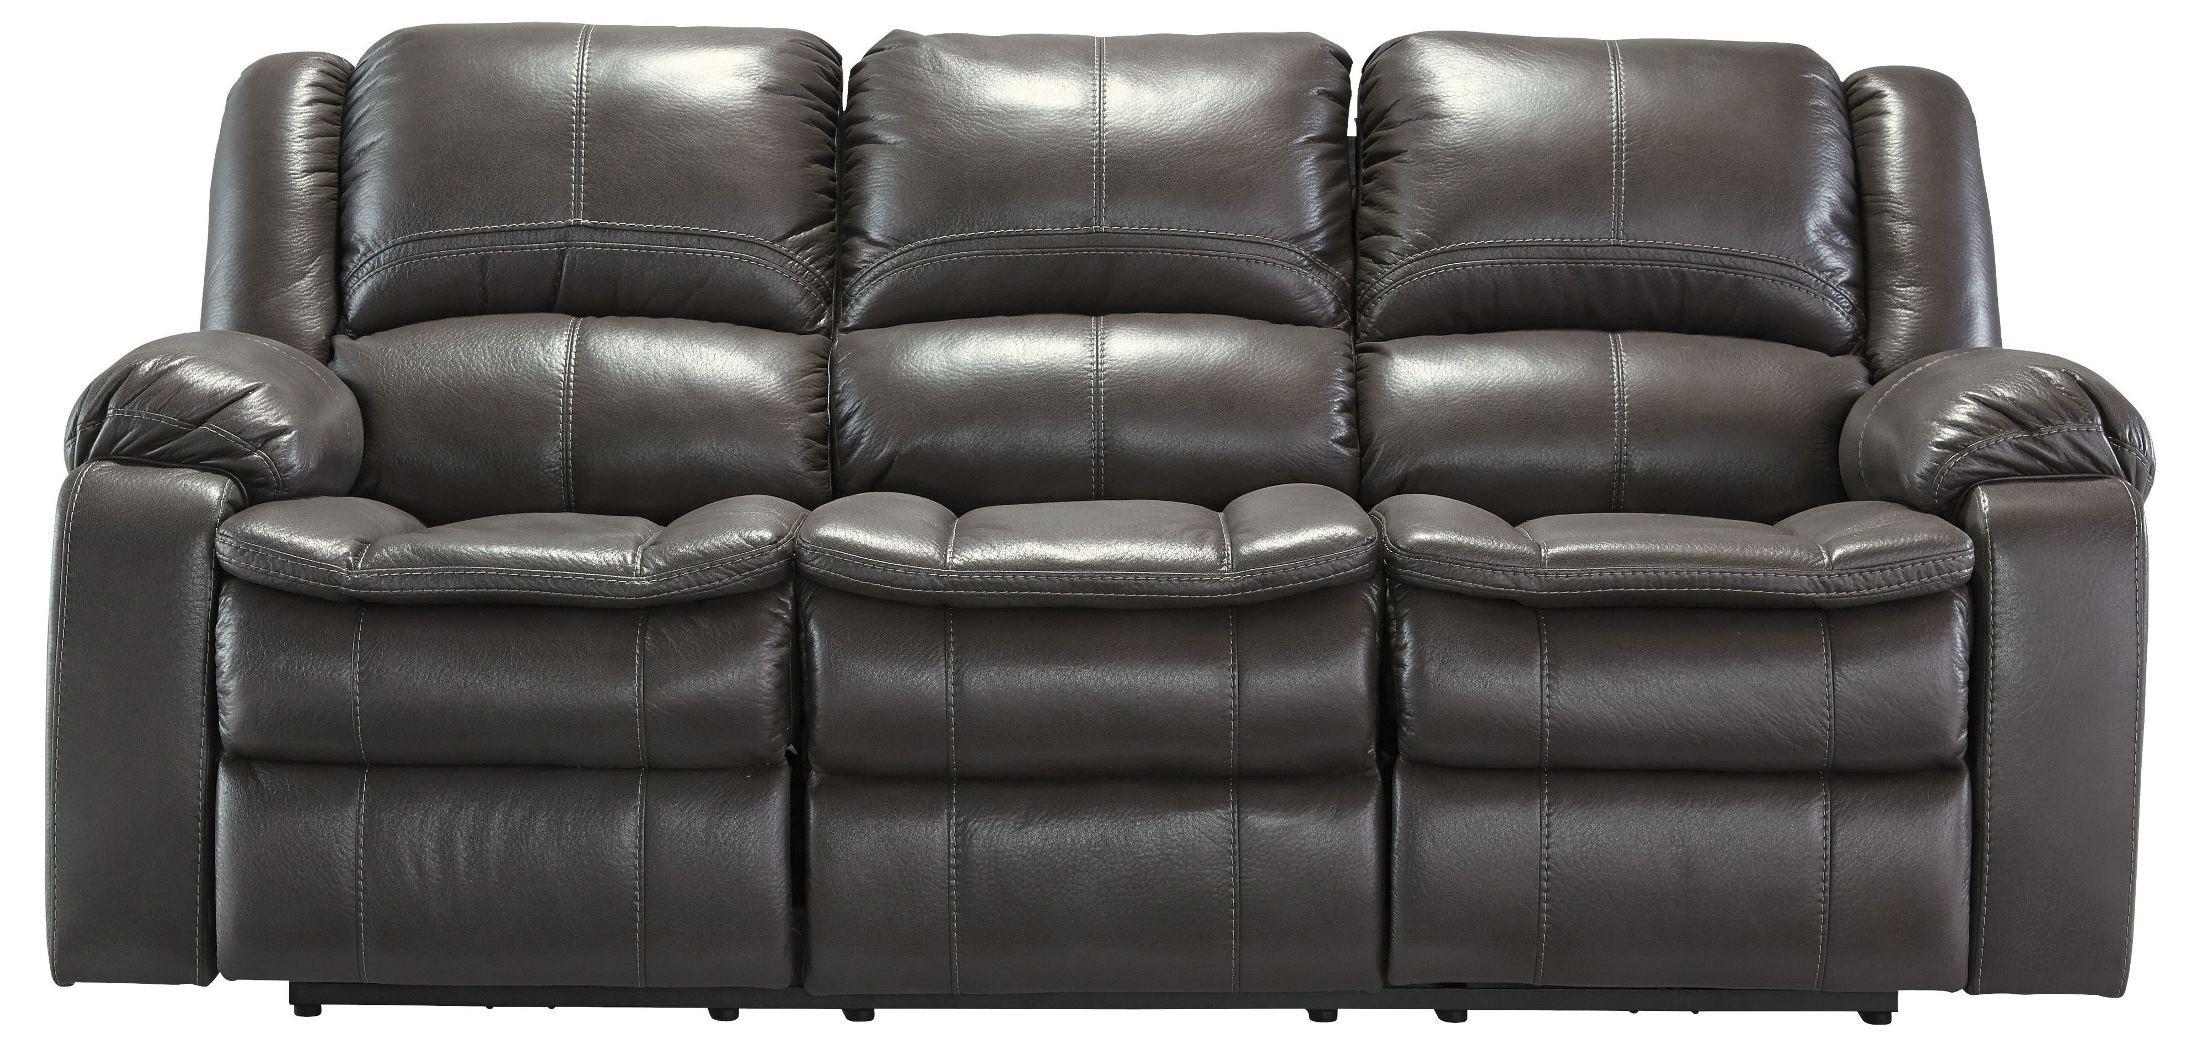 Ashley Furniture Signature Design - Long Knight Recliner Sofa - Manual Reclining - Gray